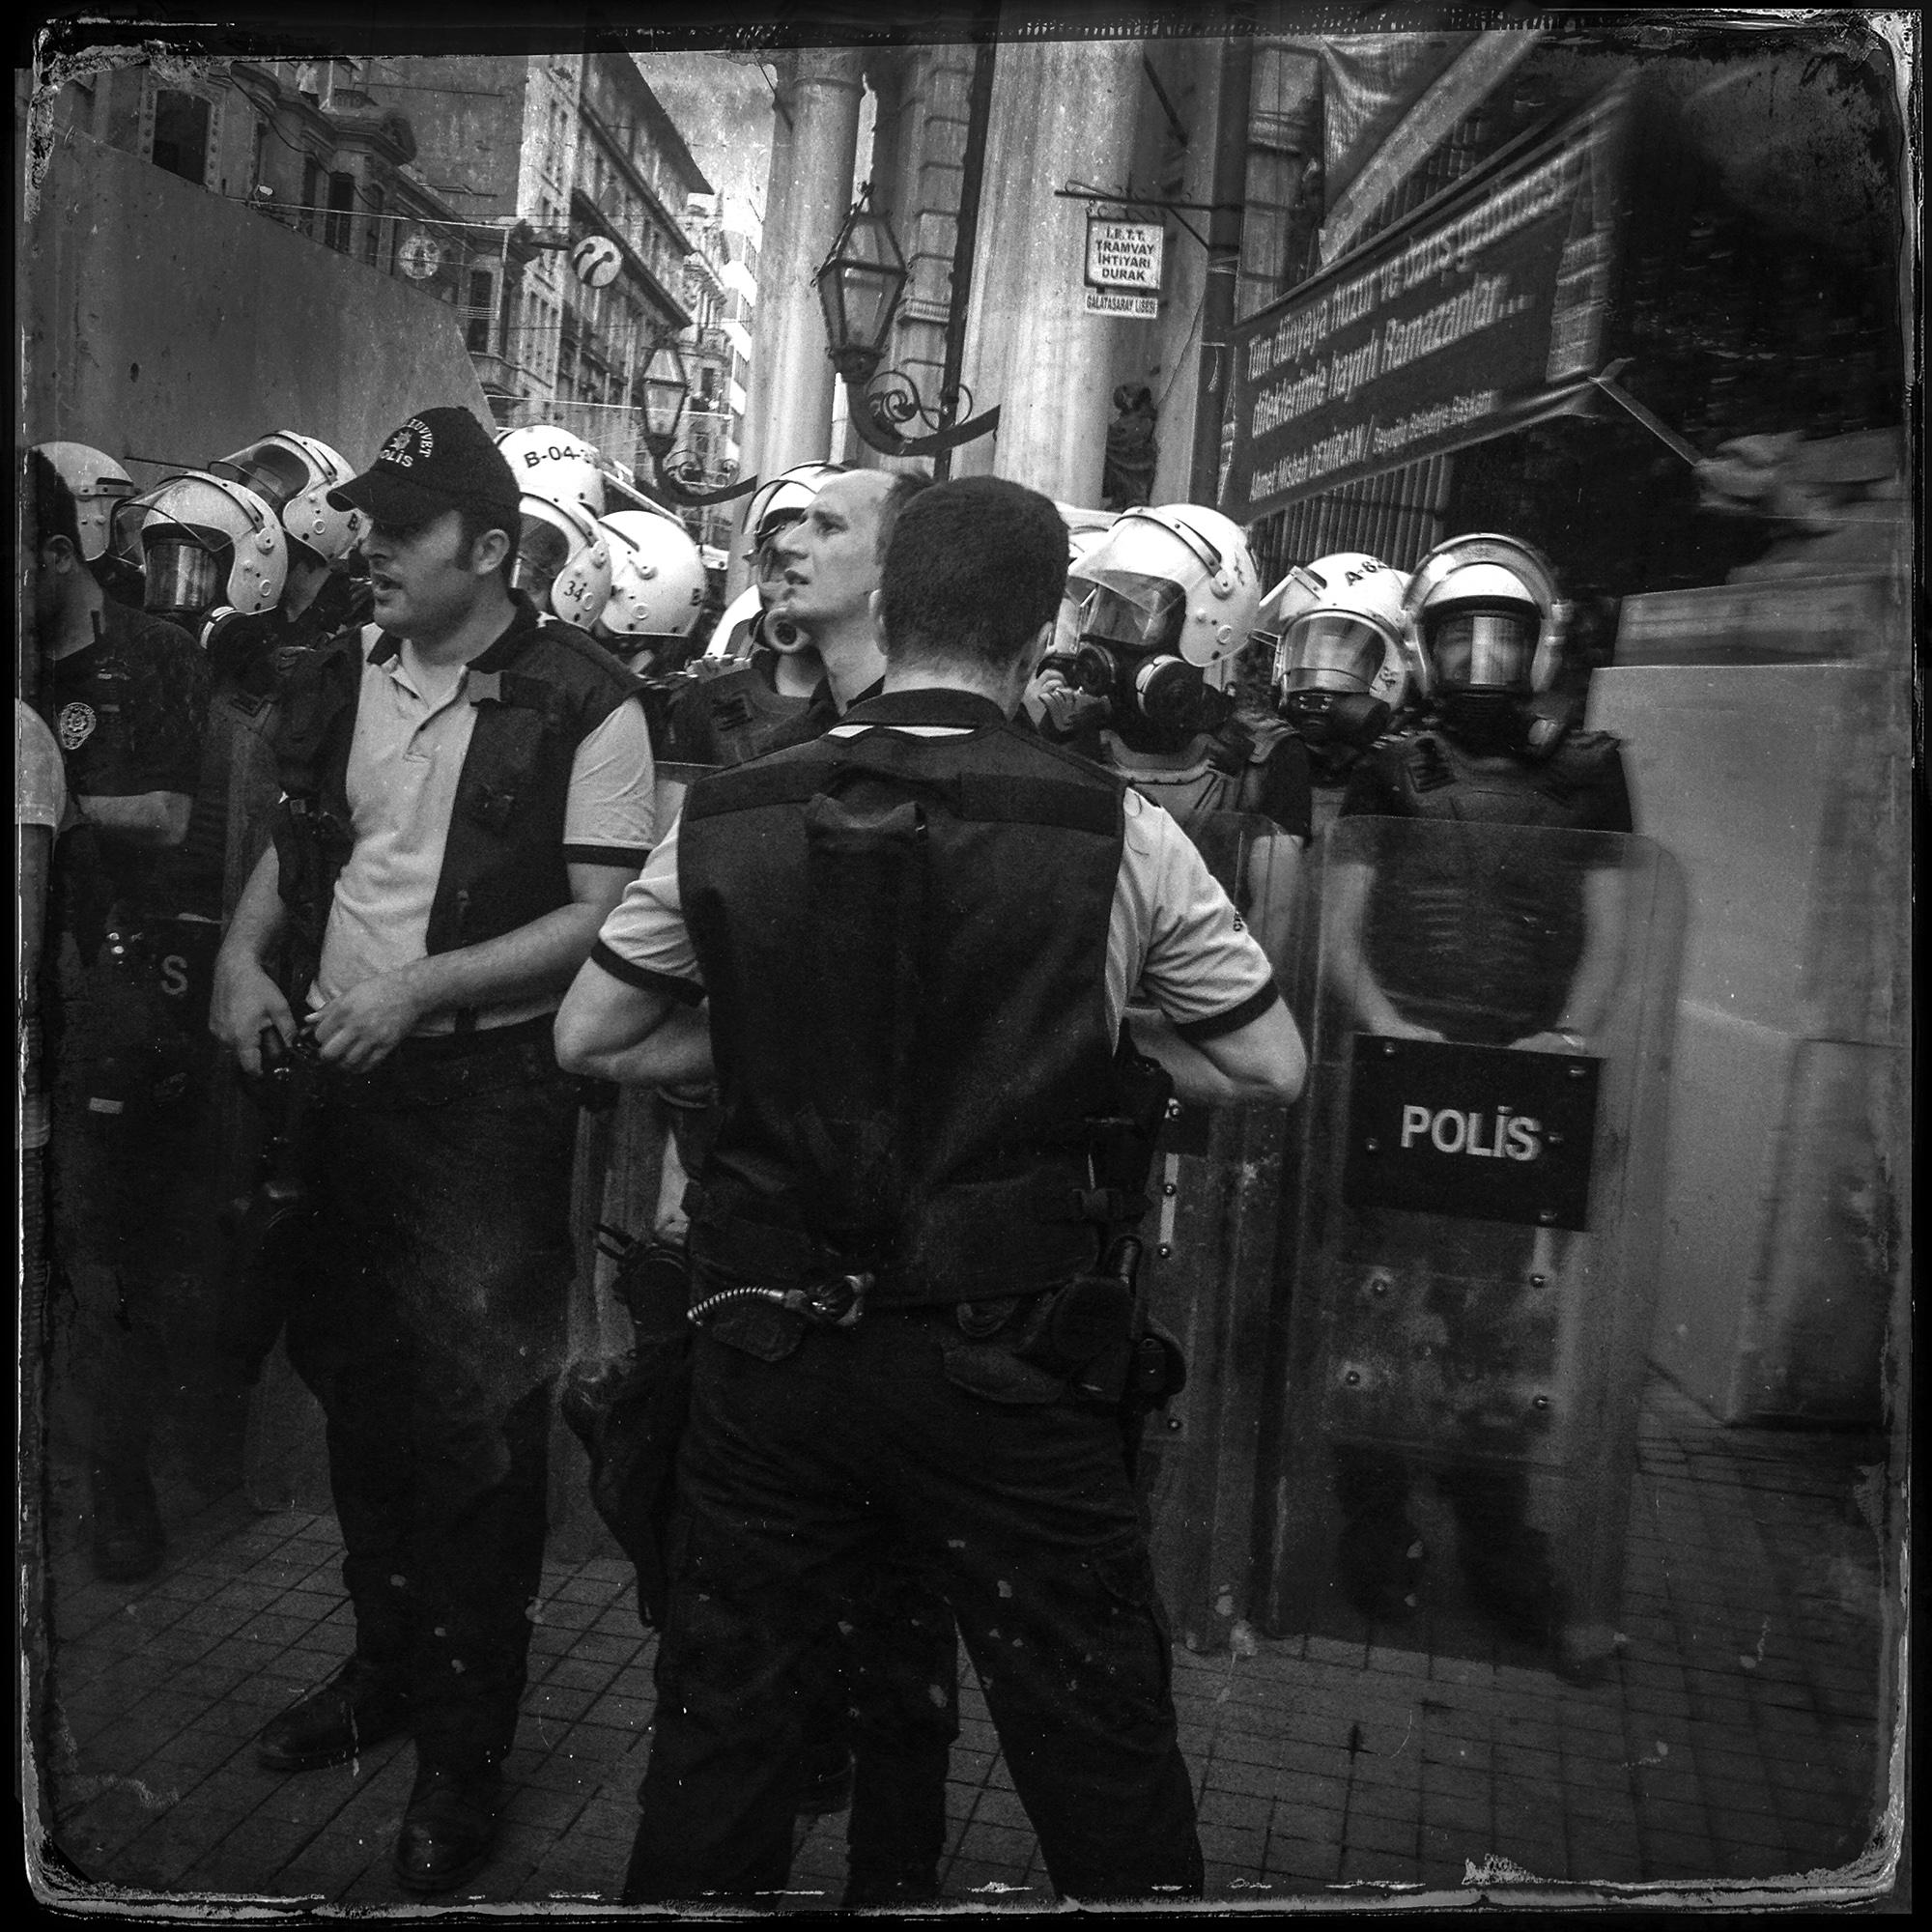 Istiklal Caddesi, Istanbul, 2013